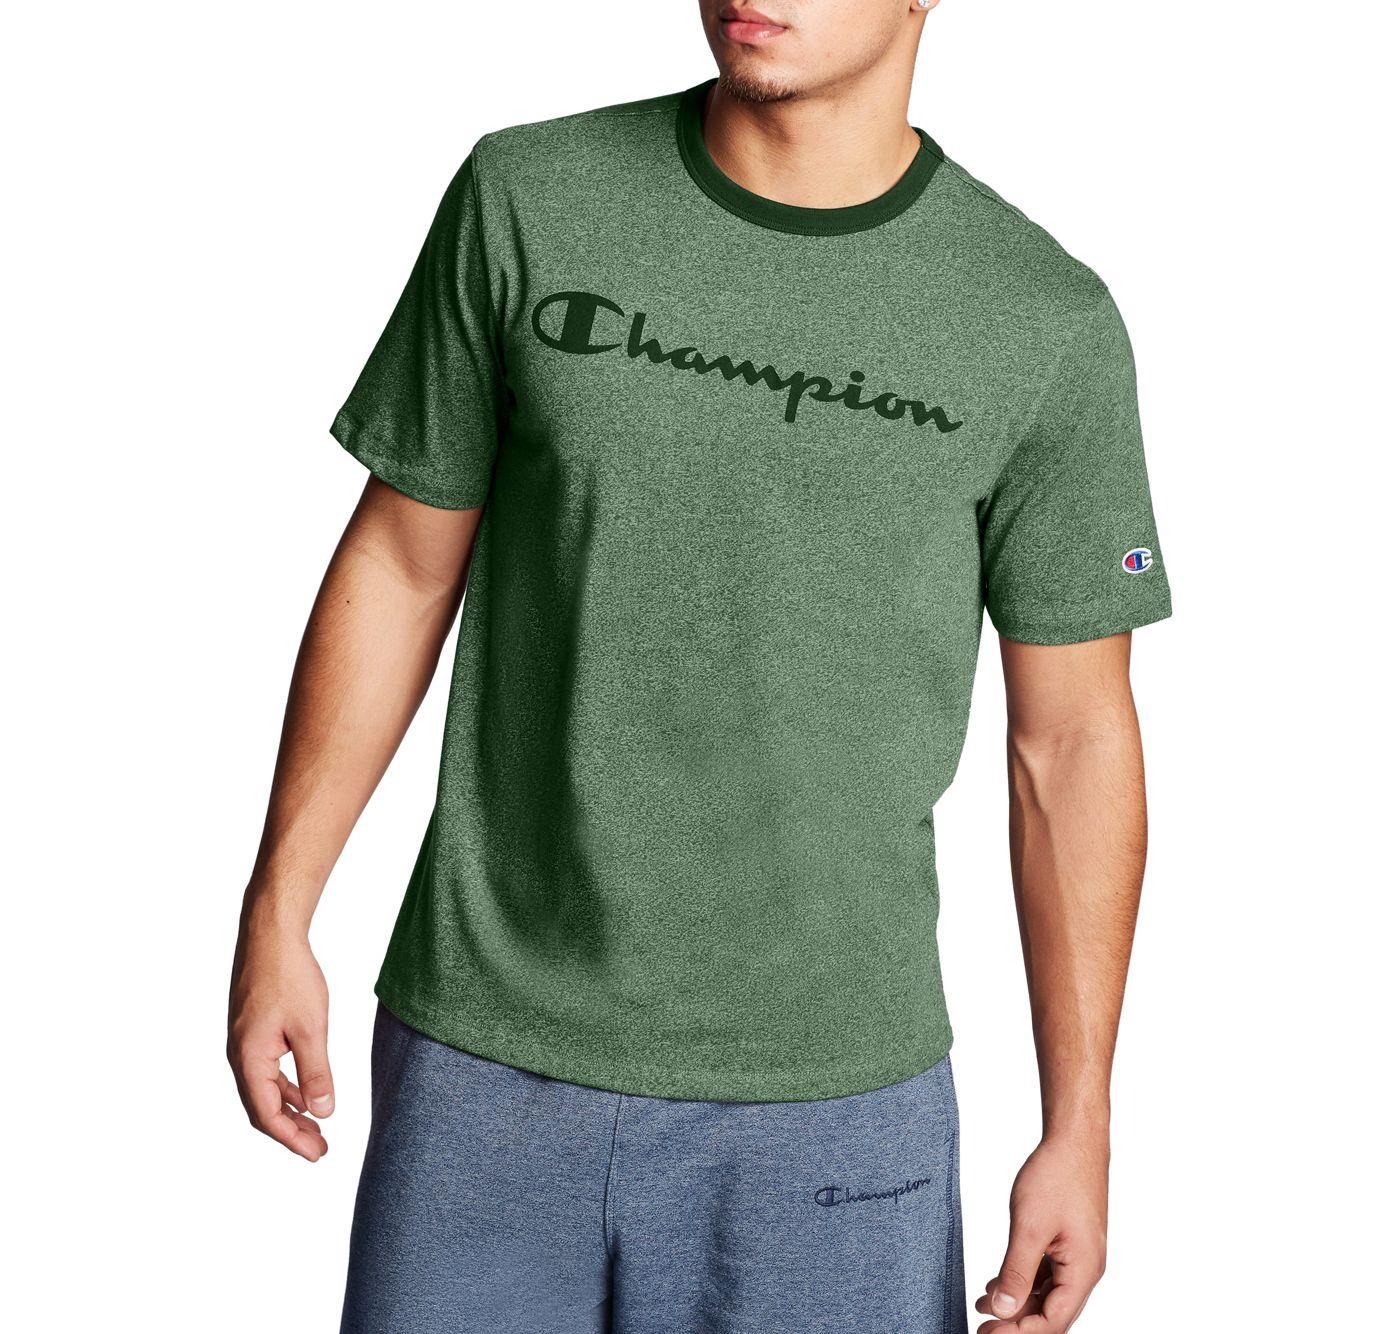 Champion Men's Heritage Heather Script Logo Graphic T-Shirt